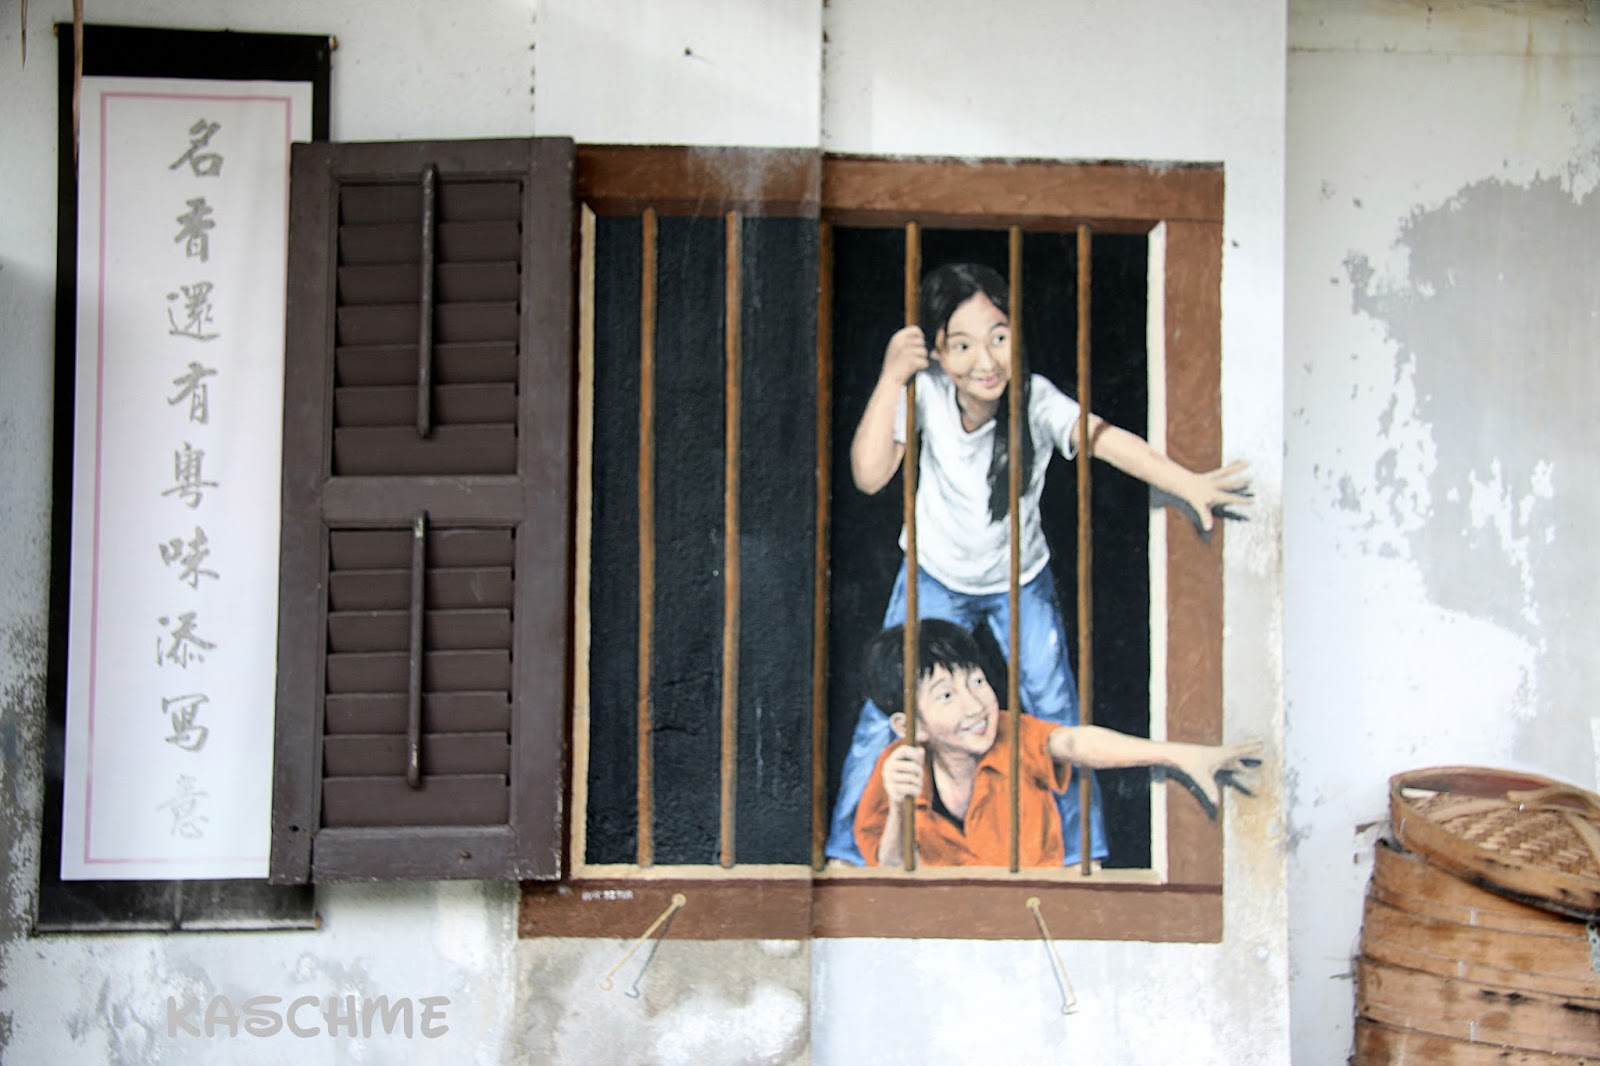 kaschme impressionen aus malaysia teil 3. Black Bedroom Furniture Sets. Home Design Ideas